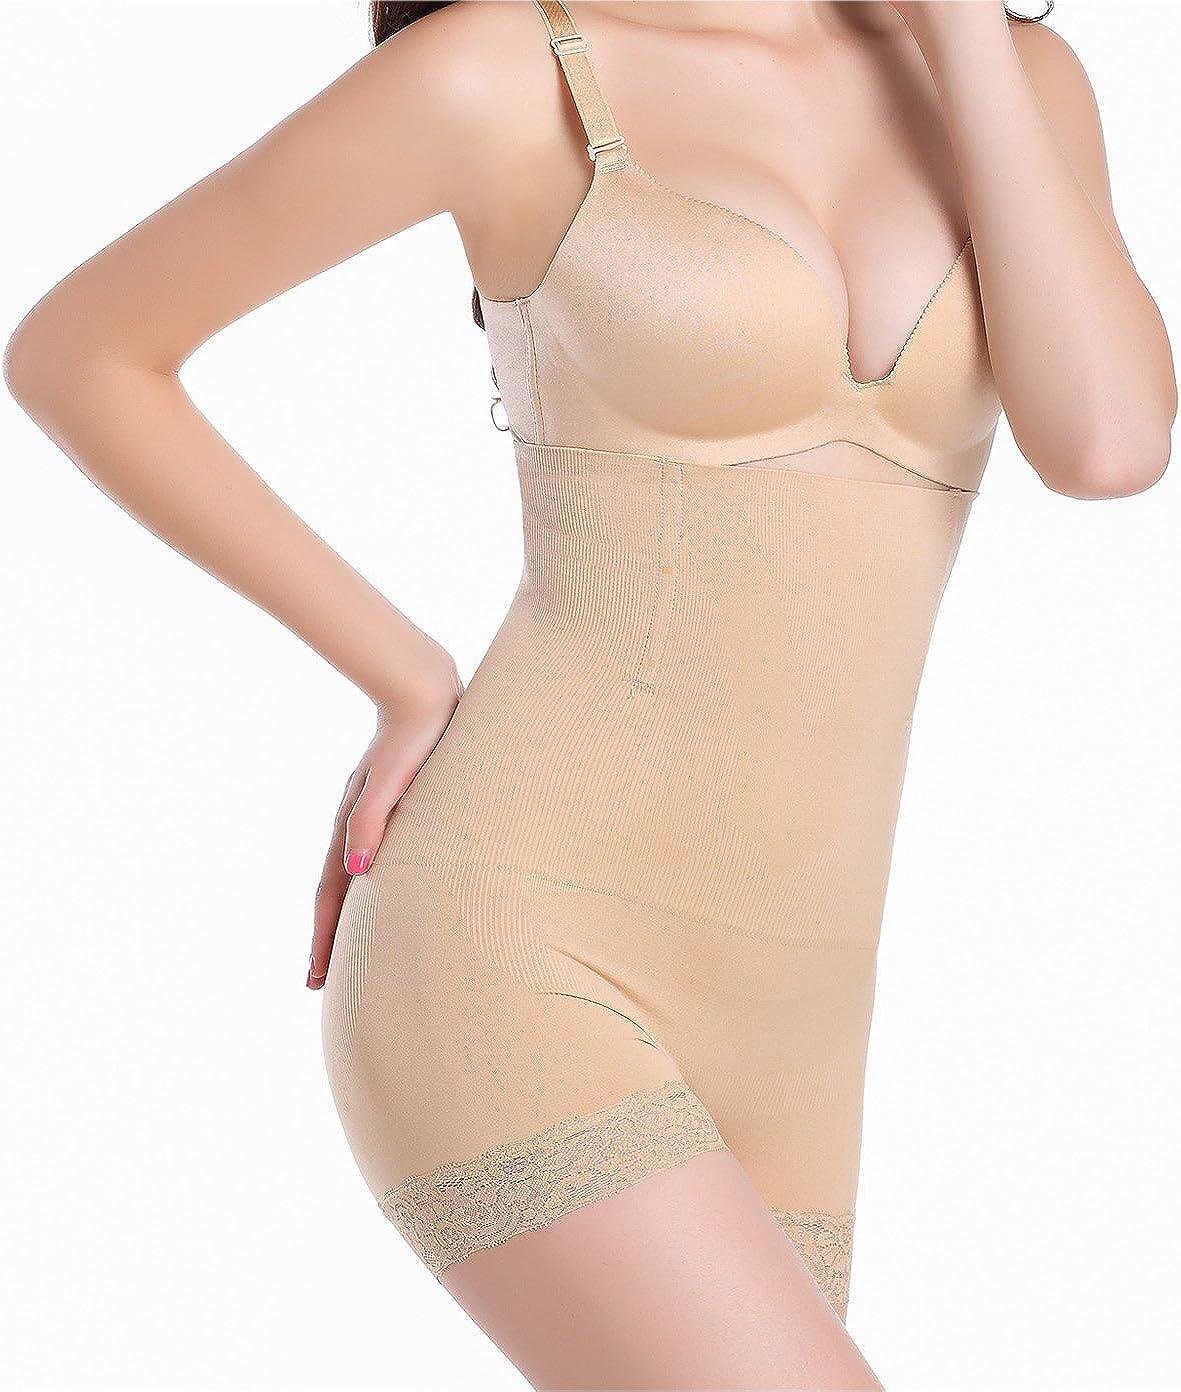 SLTY Womens High Waist Shapewear Tummy Control Waist Cincher Girdle Seamless Control Panty Jacquard Boyshorts